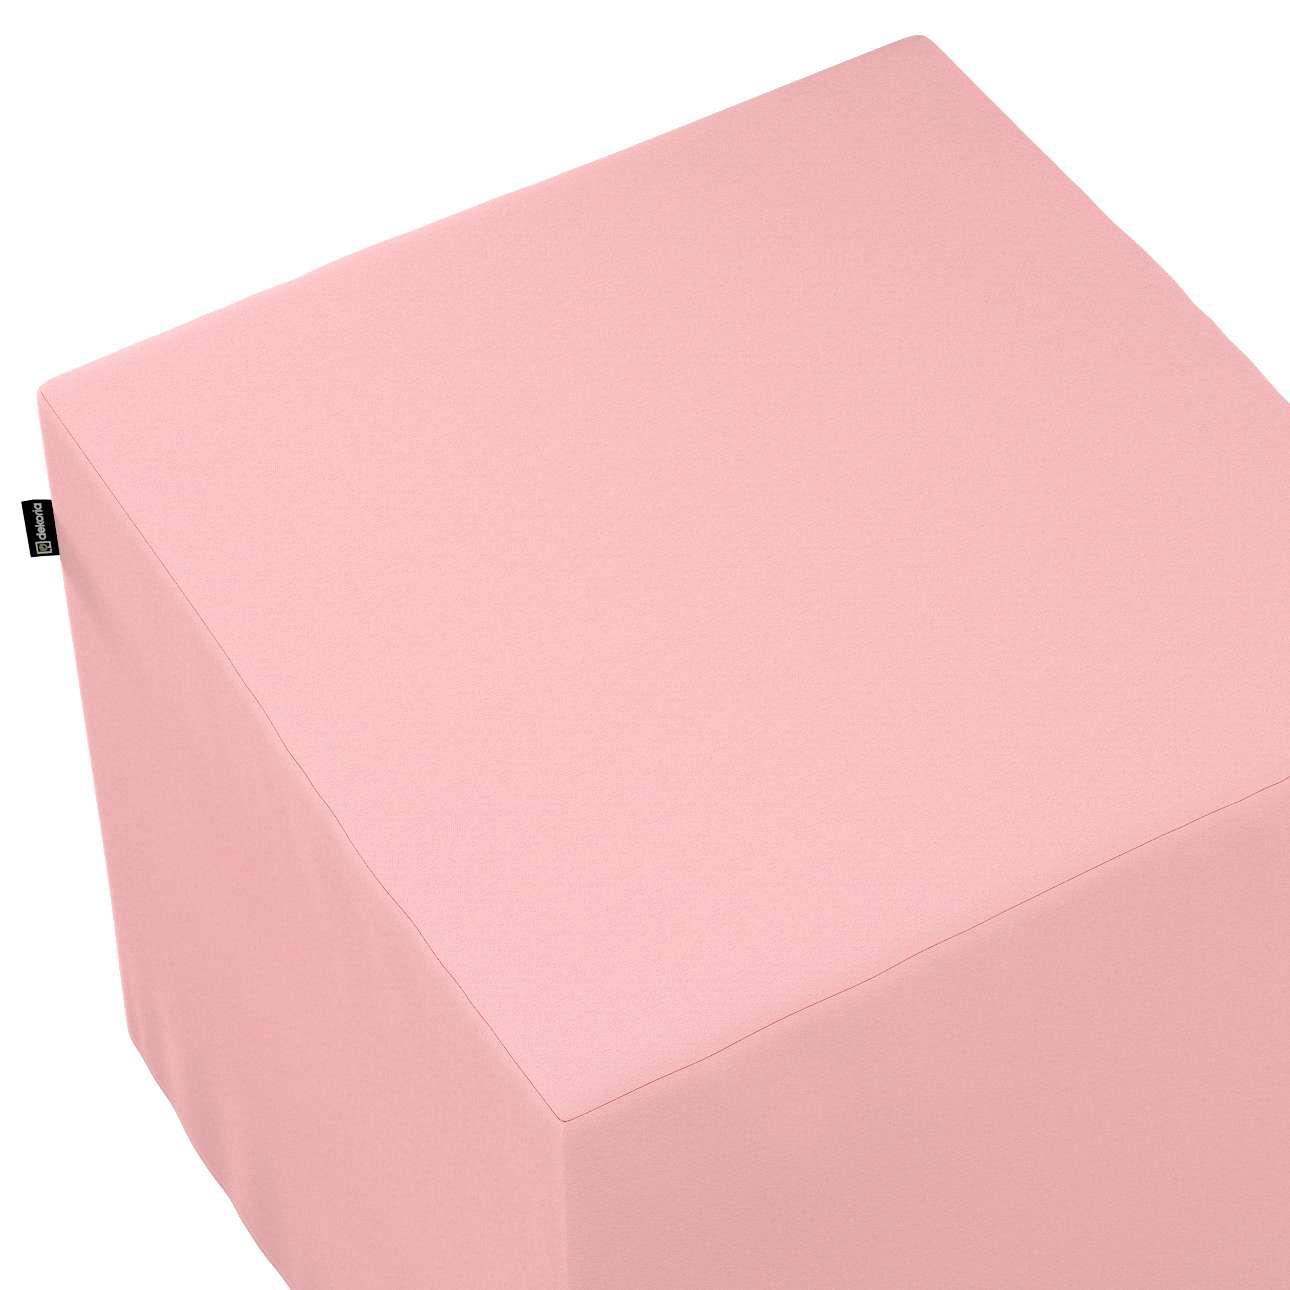 Pufa kostka w kolekcji Loneta, tkanina: 133-39